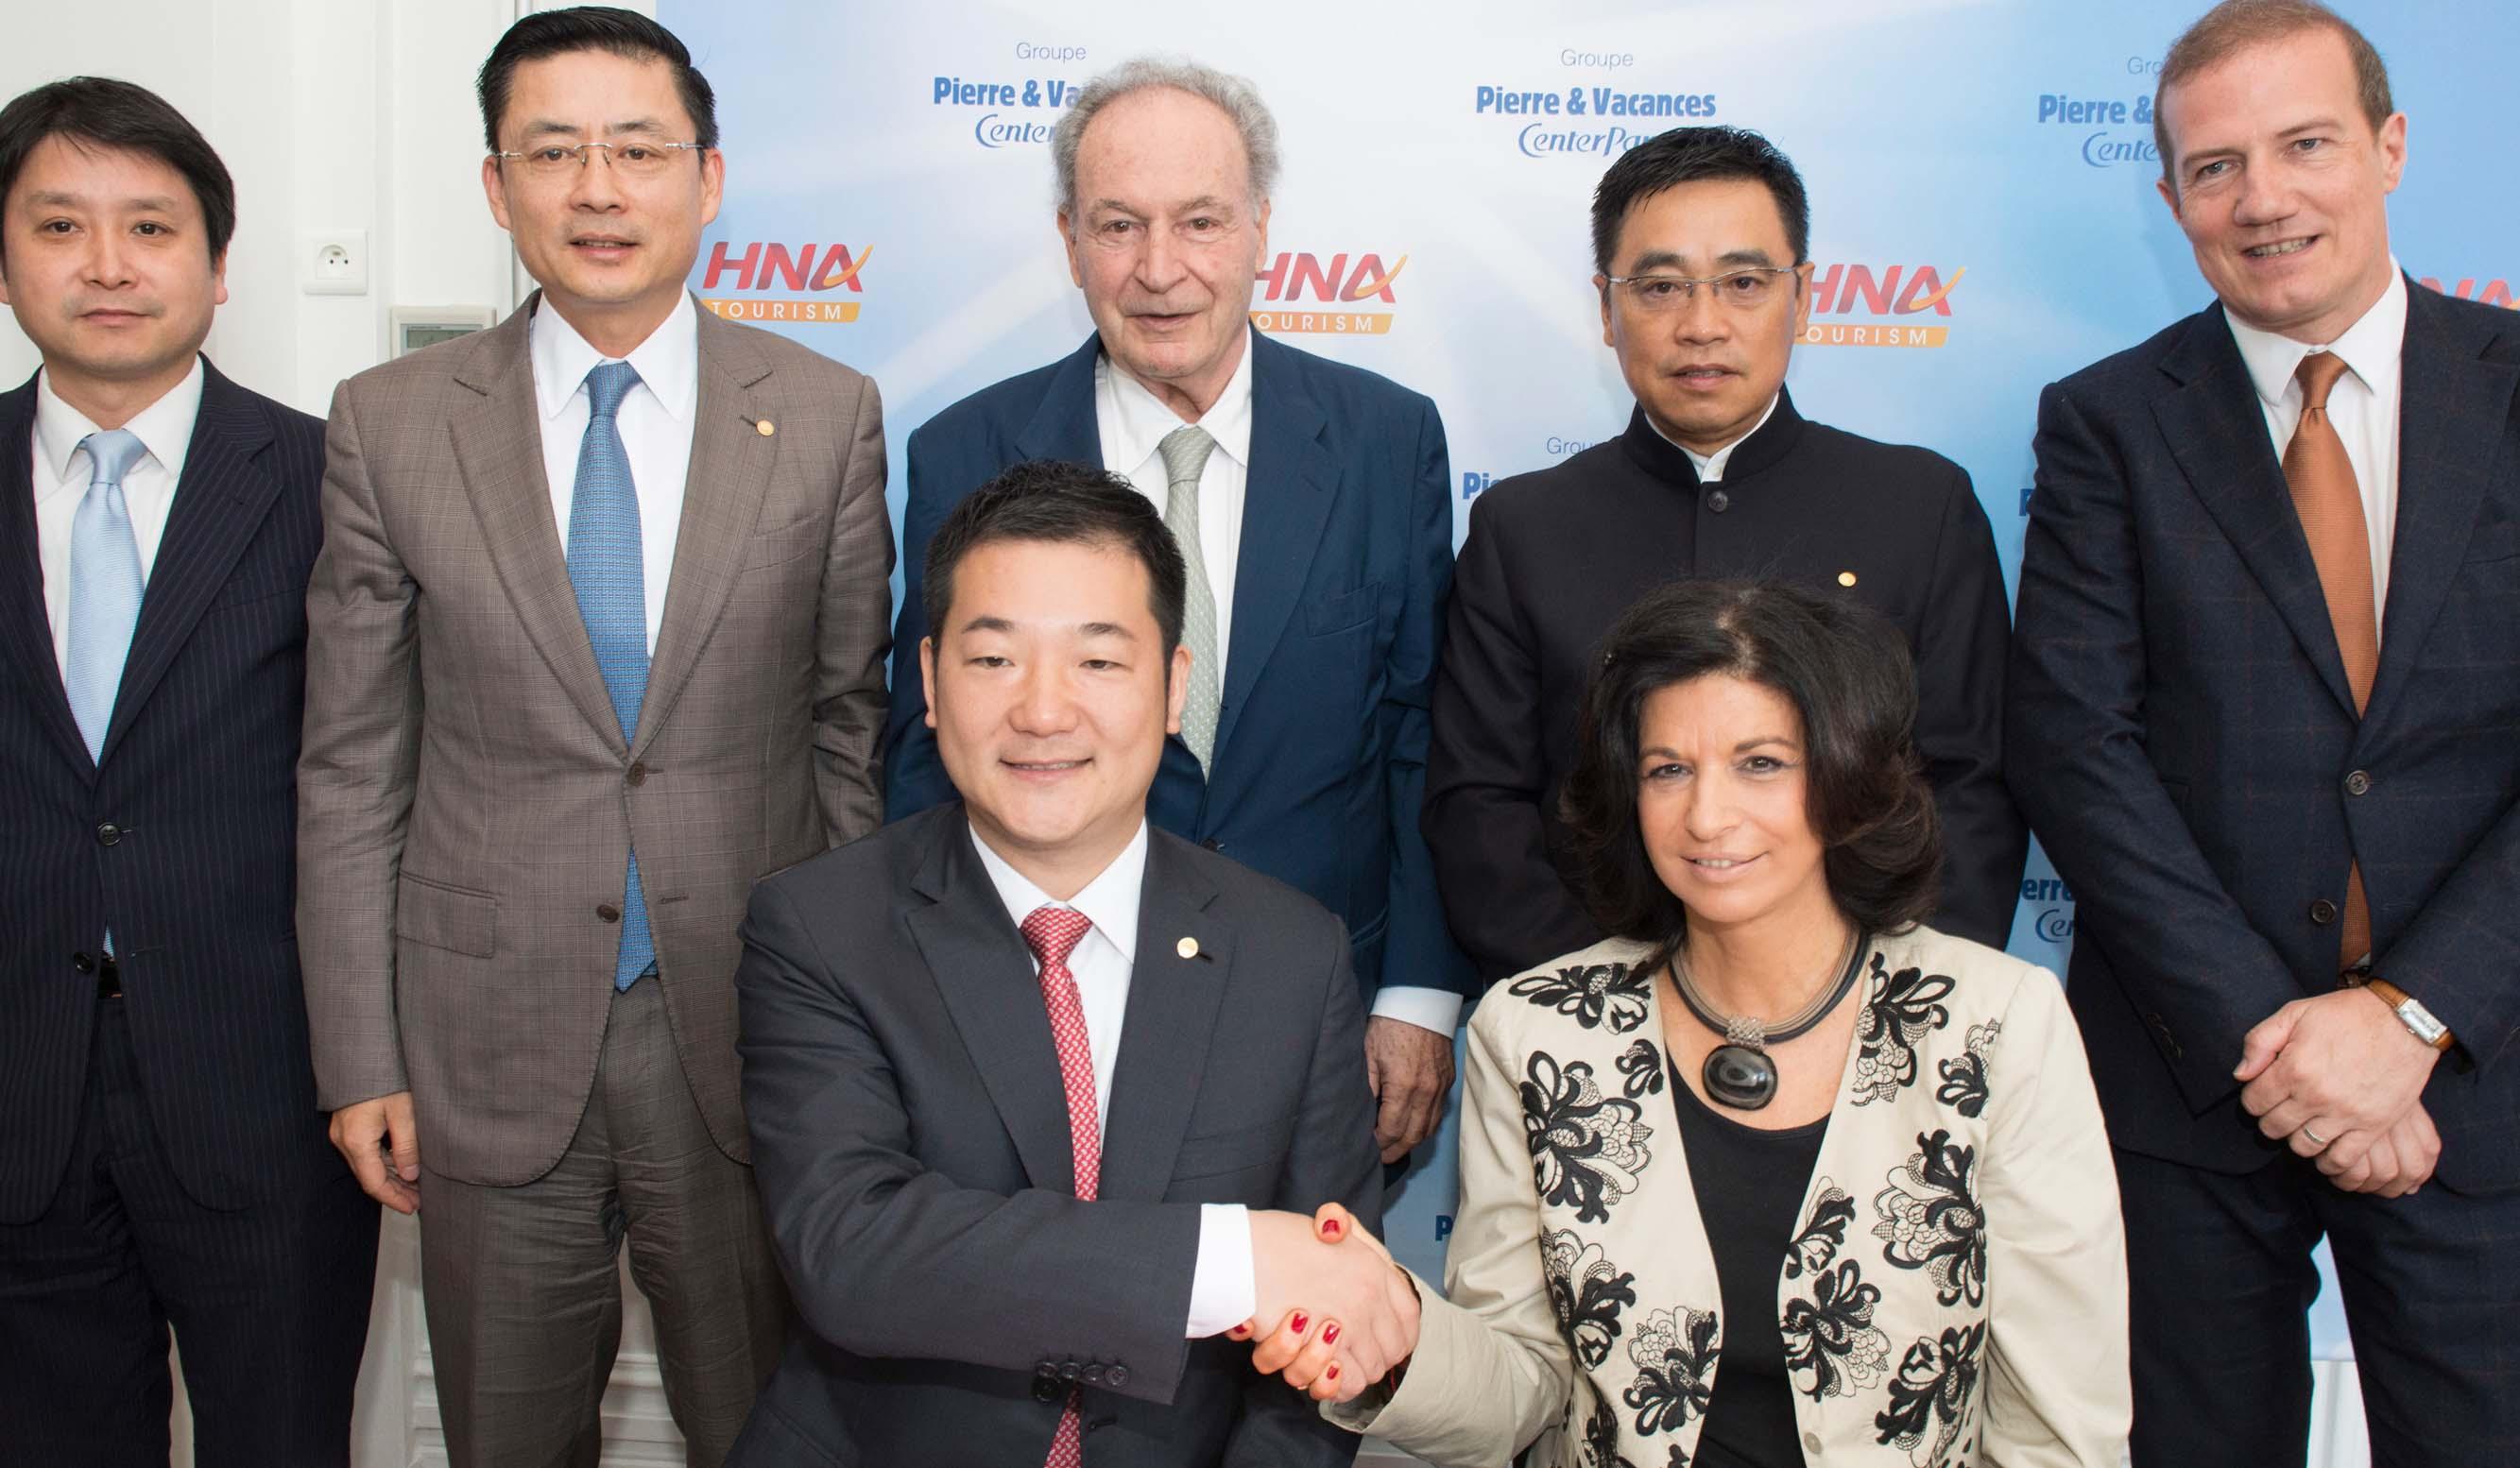 Partnership HNA - PVCP